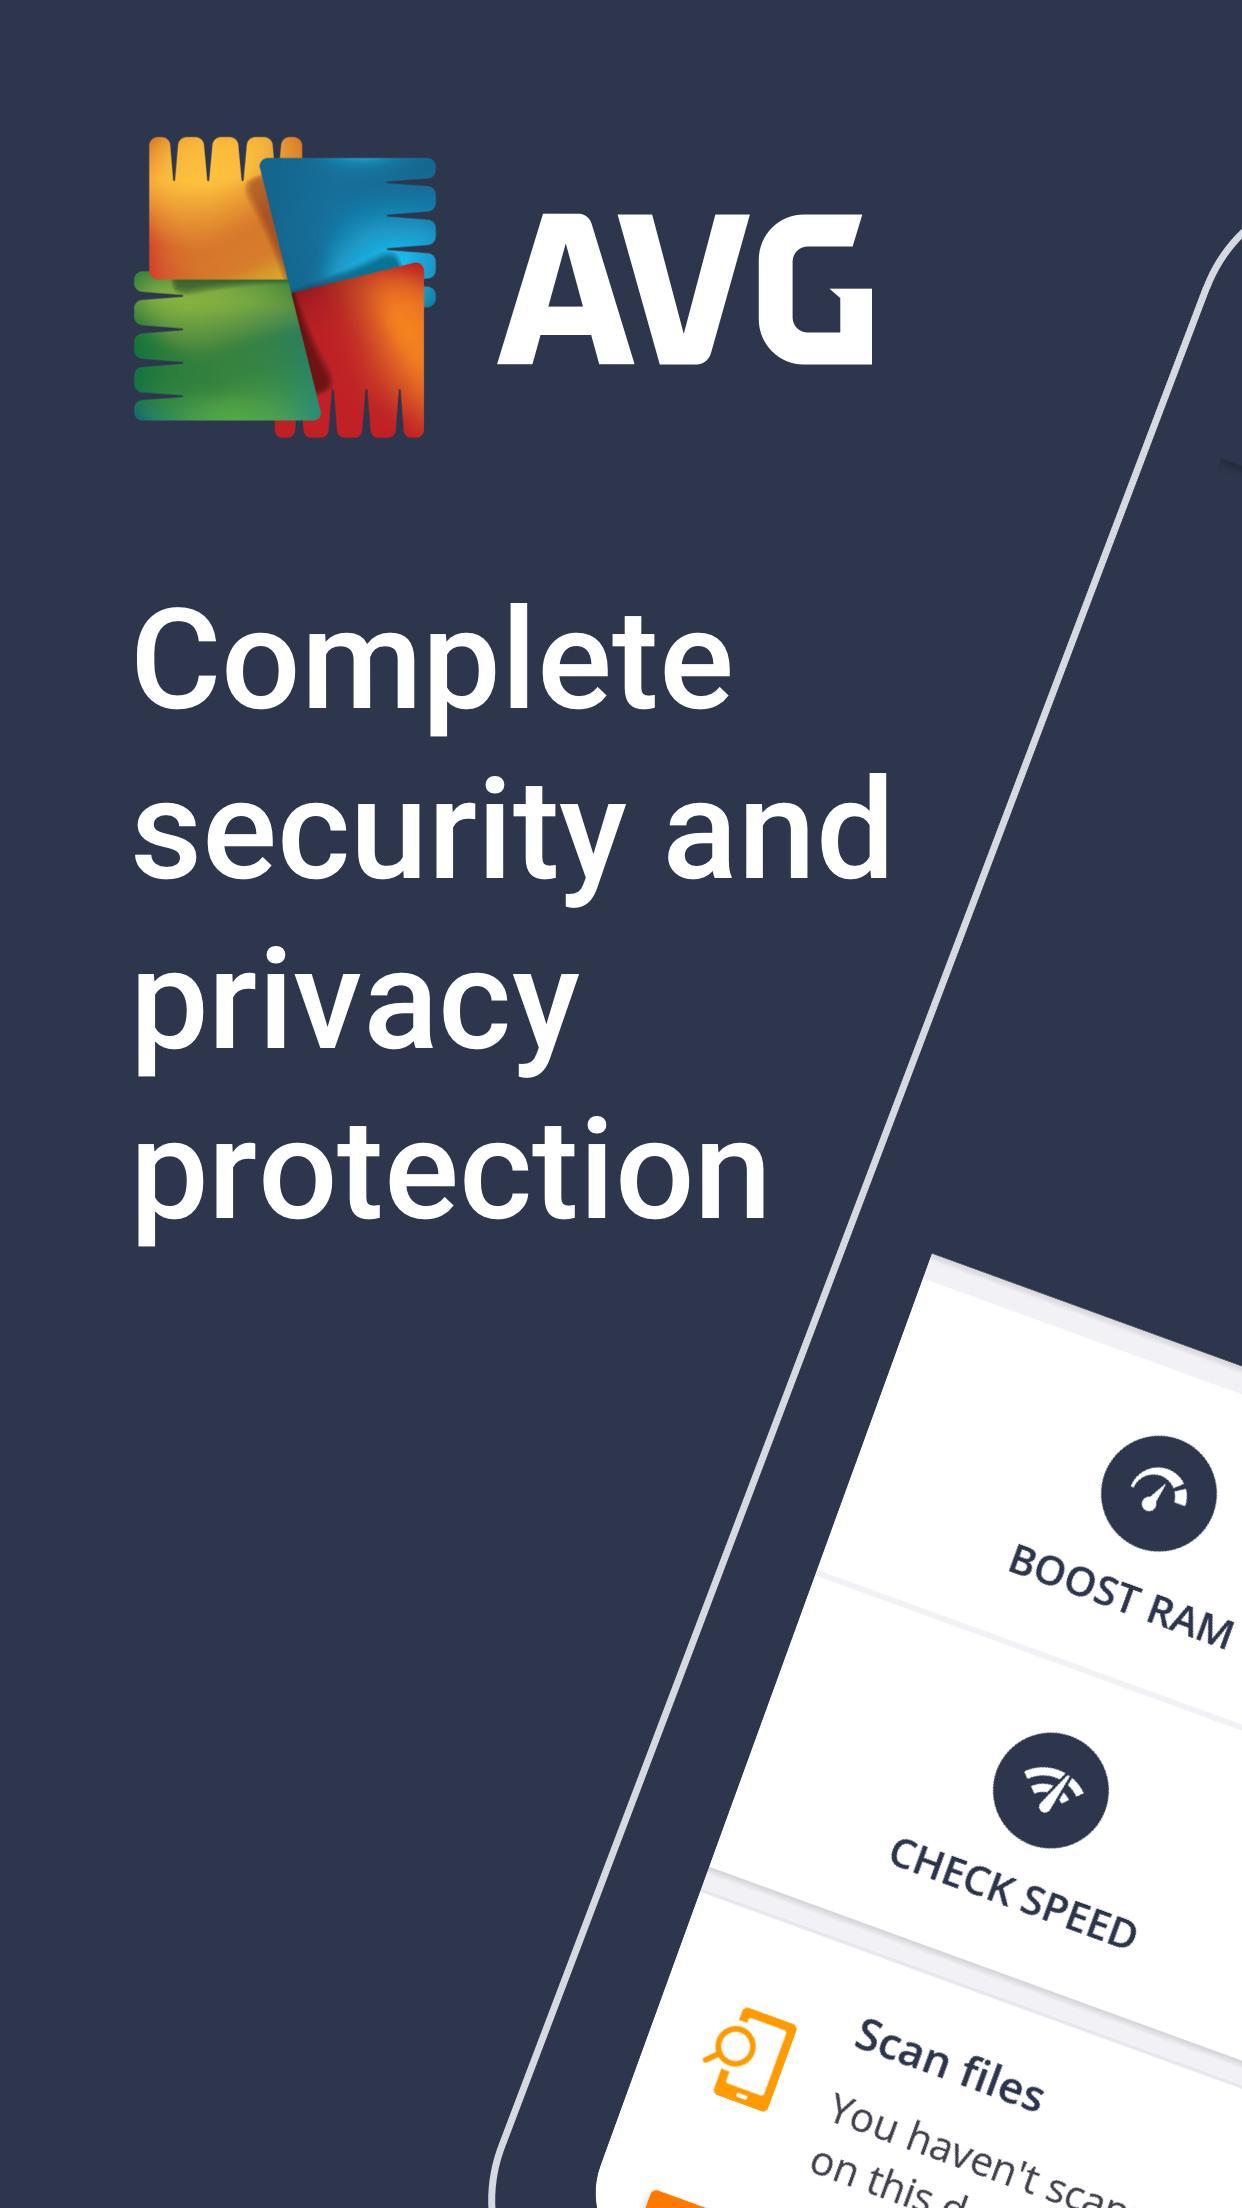 AVG-Android-Antivirus-Security